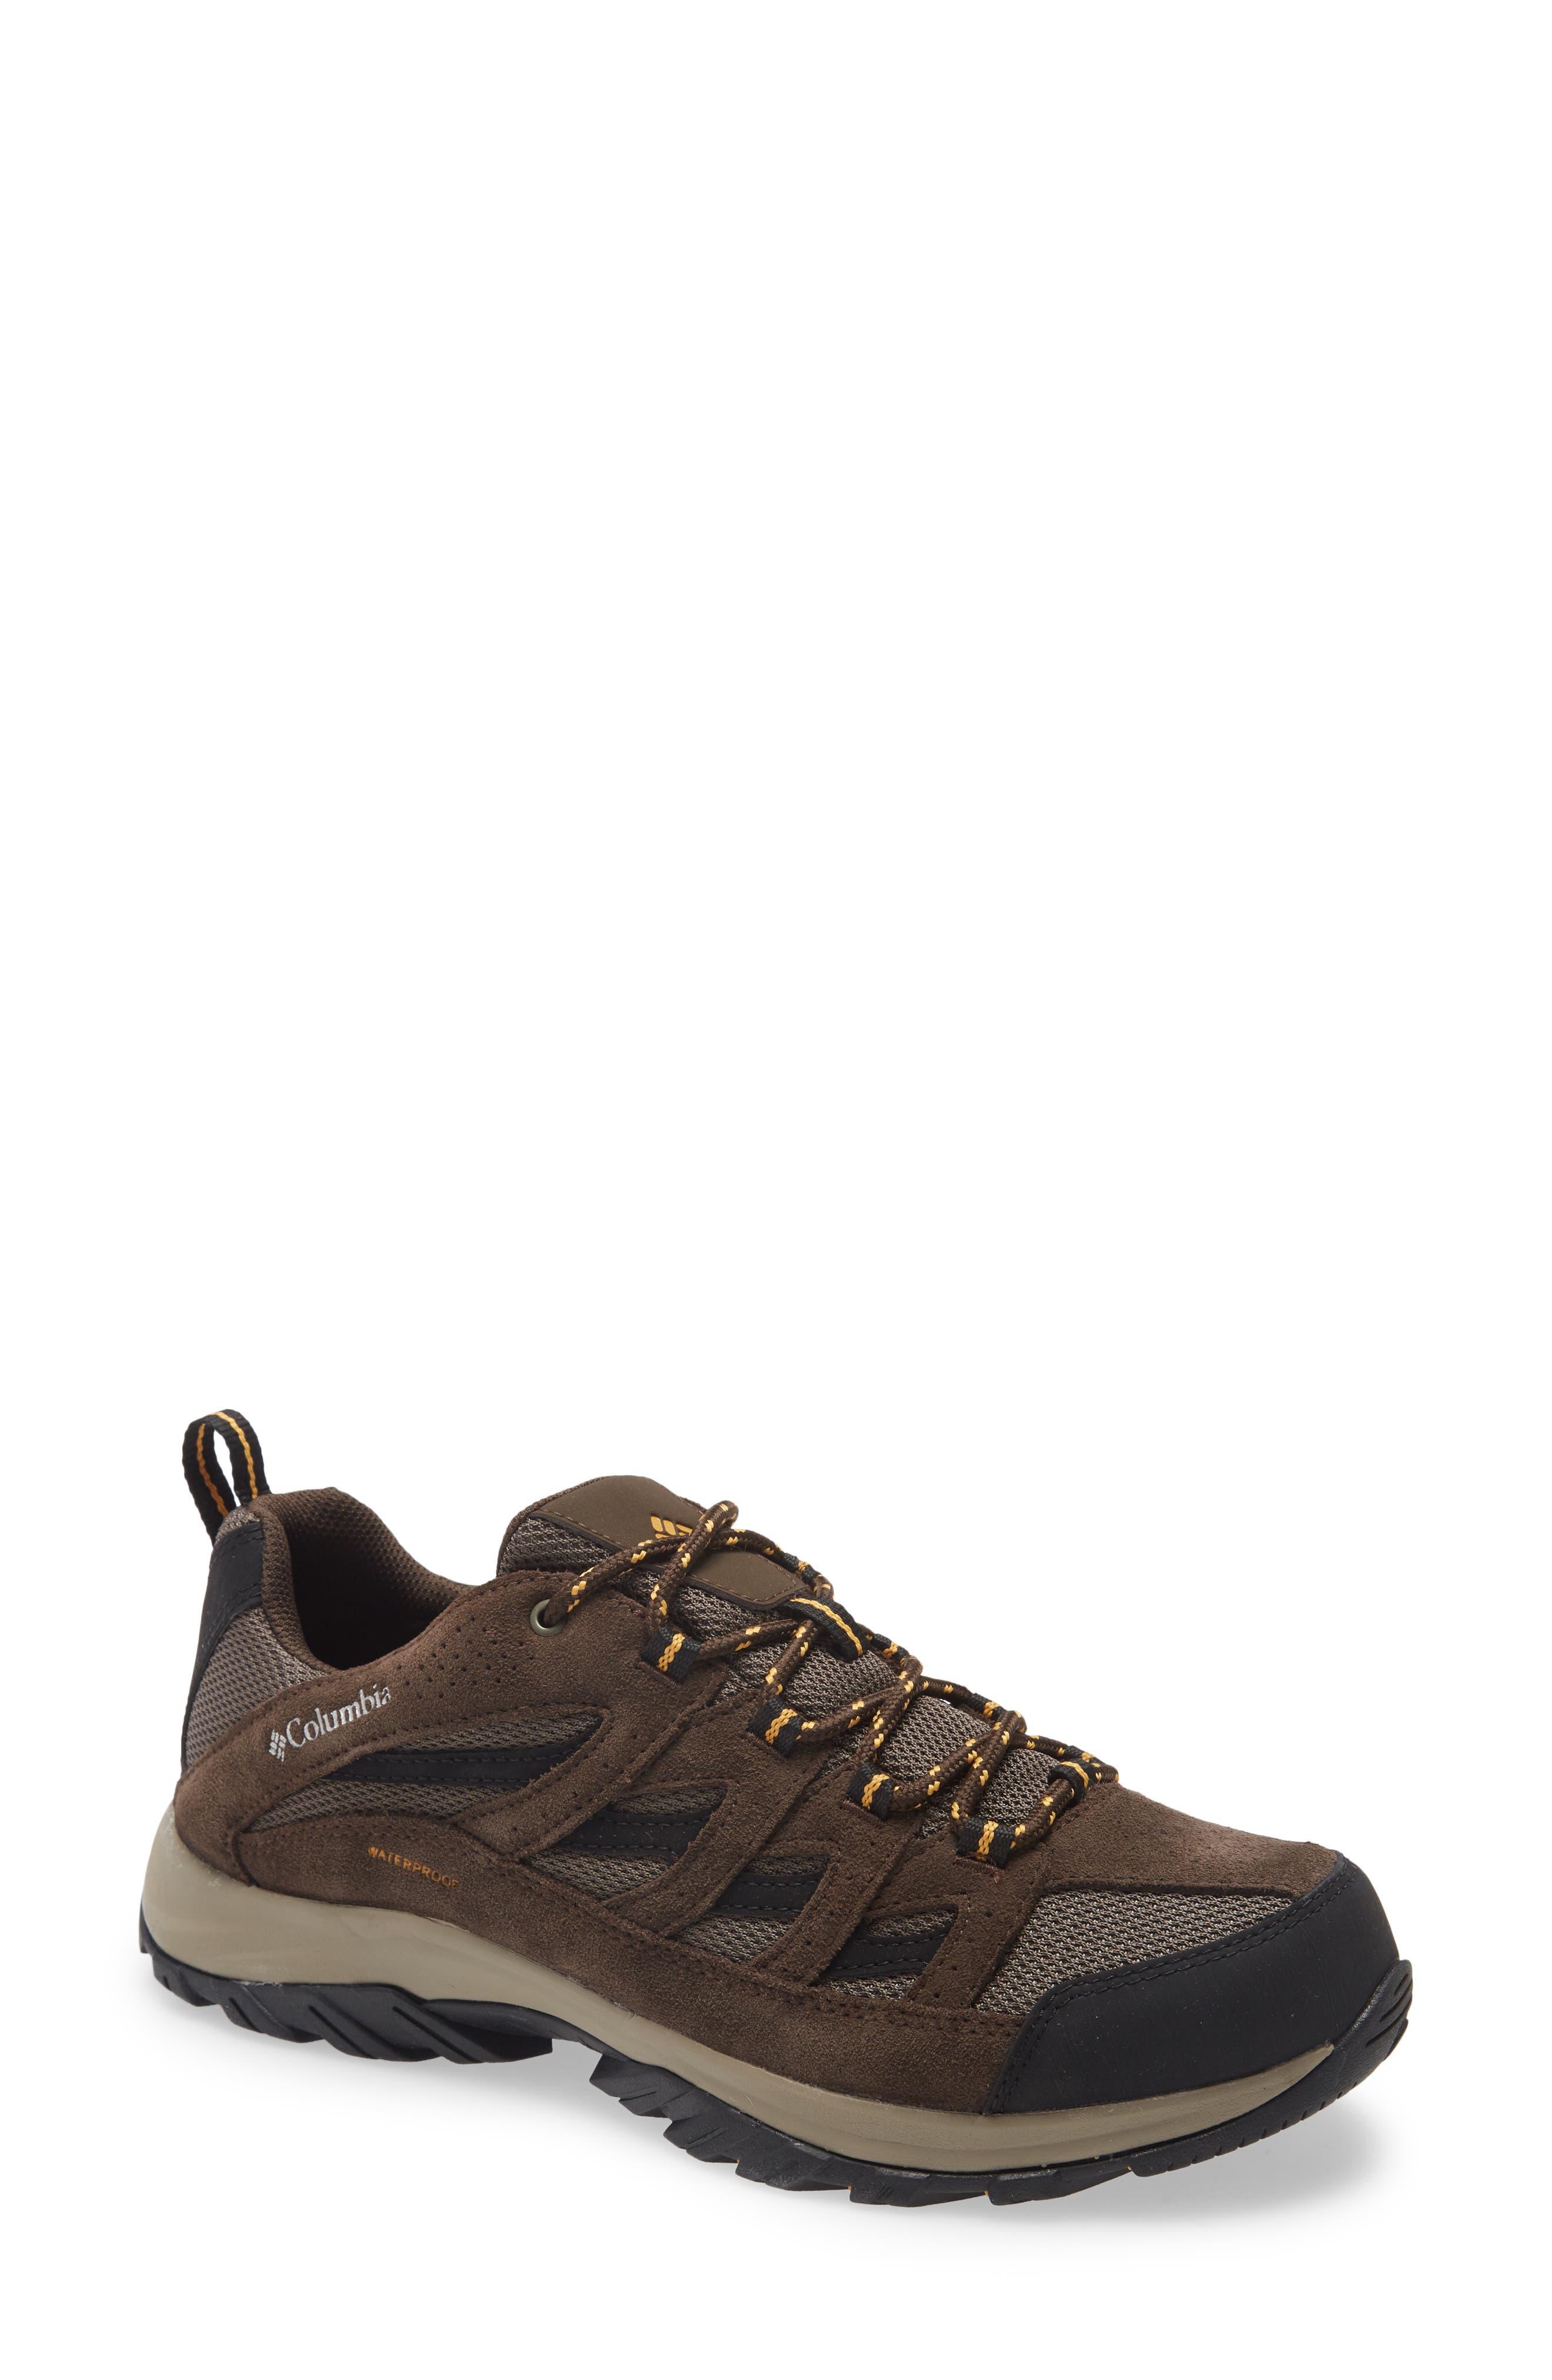 Crestwood Waterproof Hiking Shoe